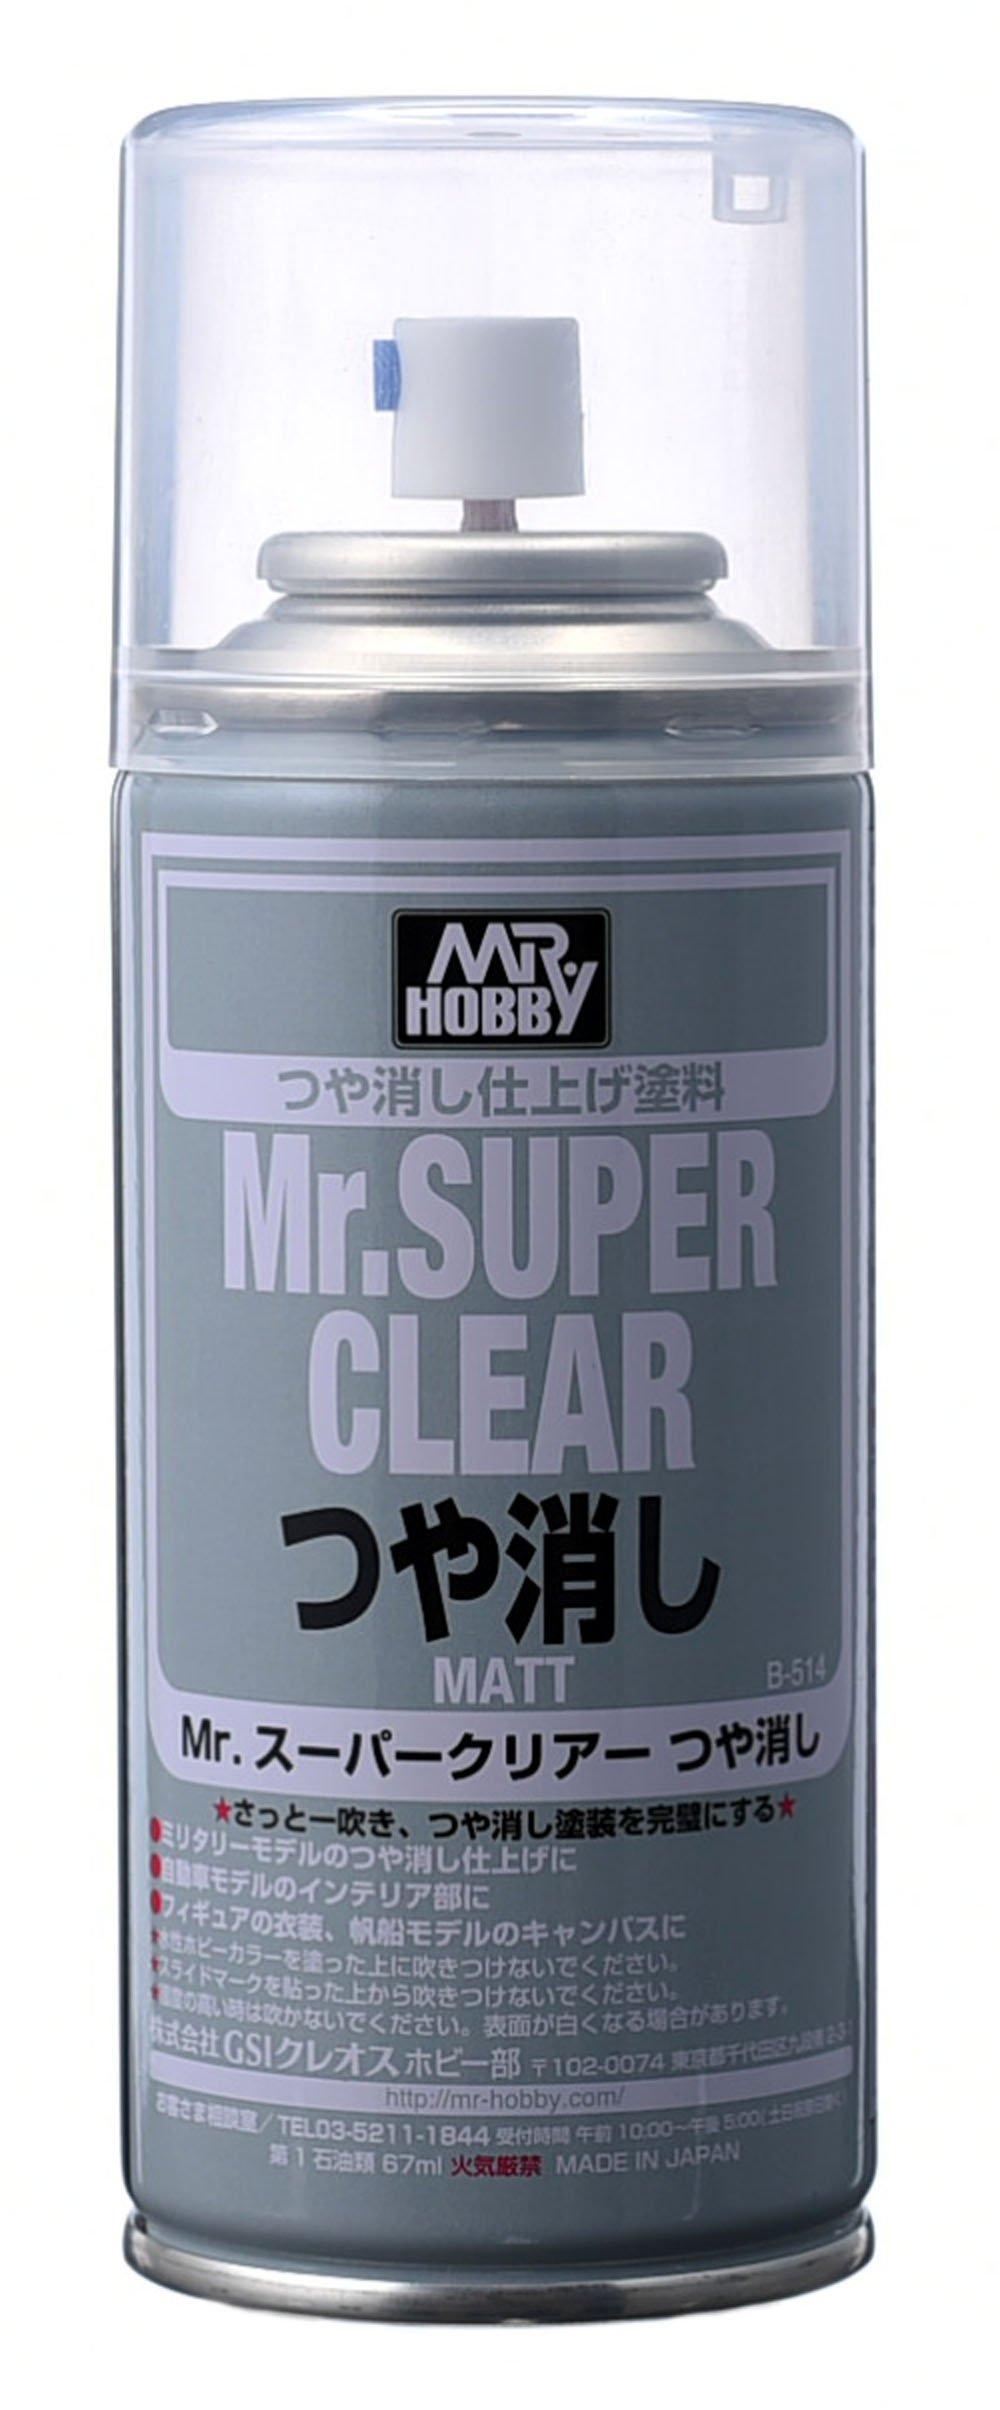 Mr. Super Clear Flat Spray